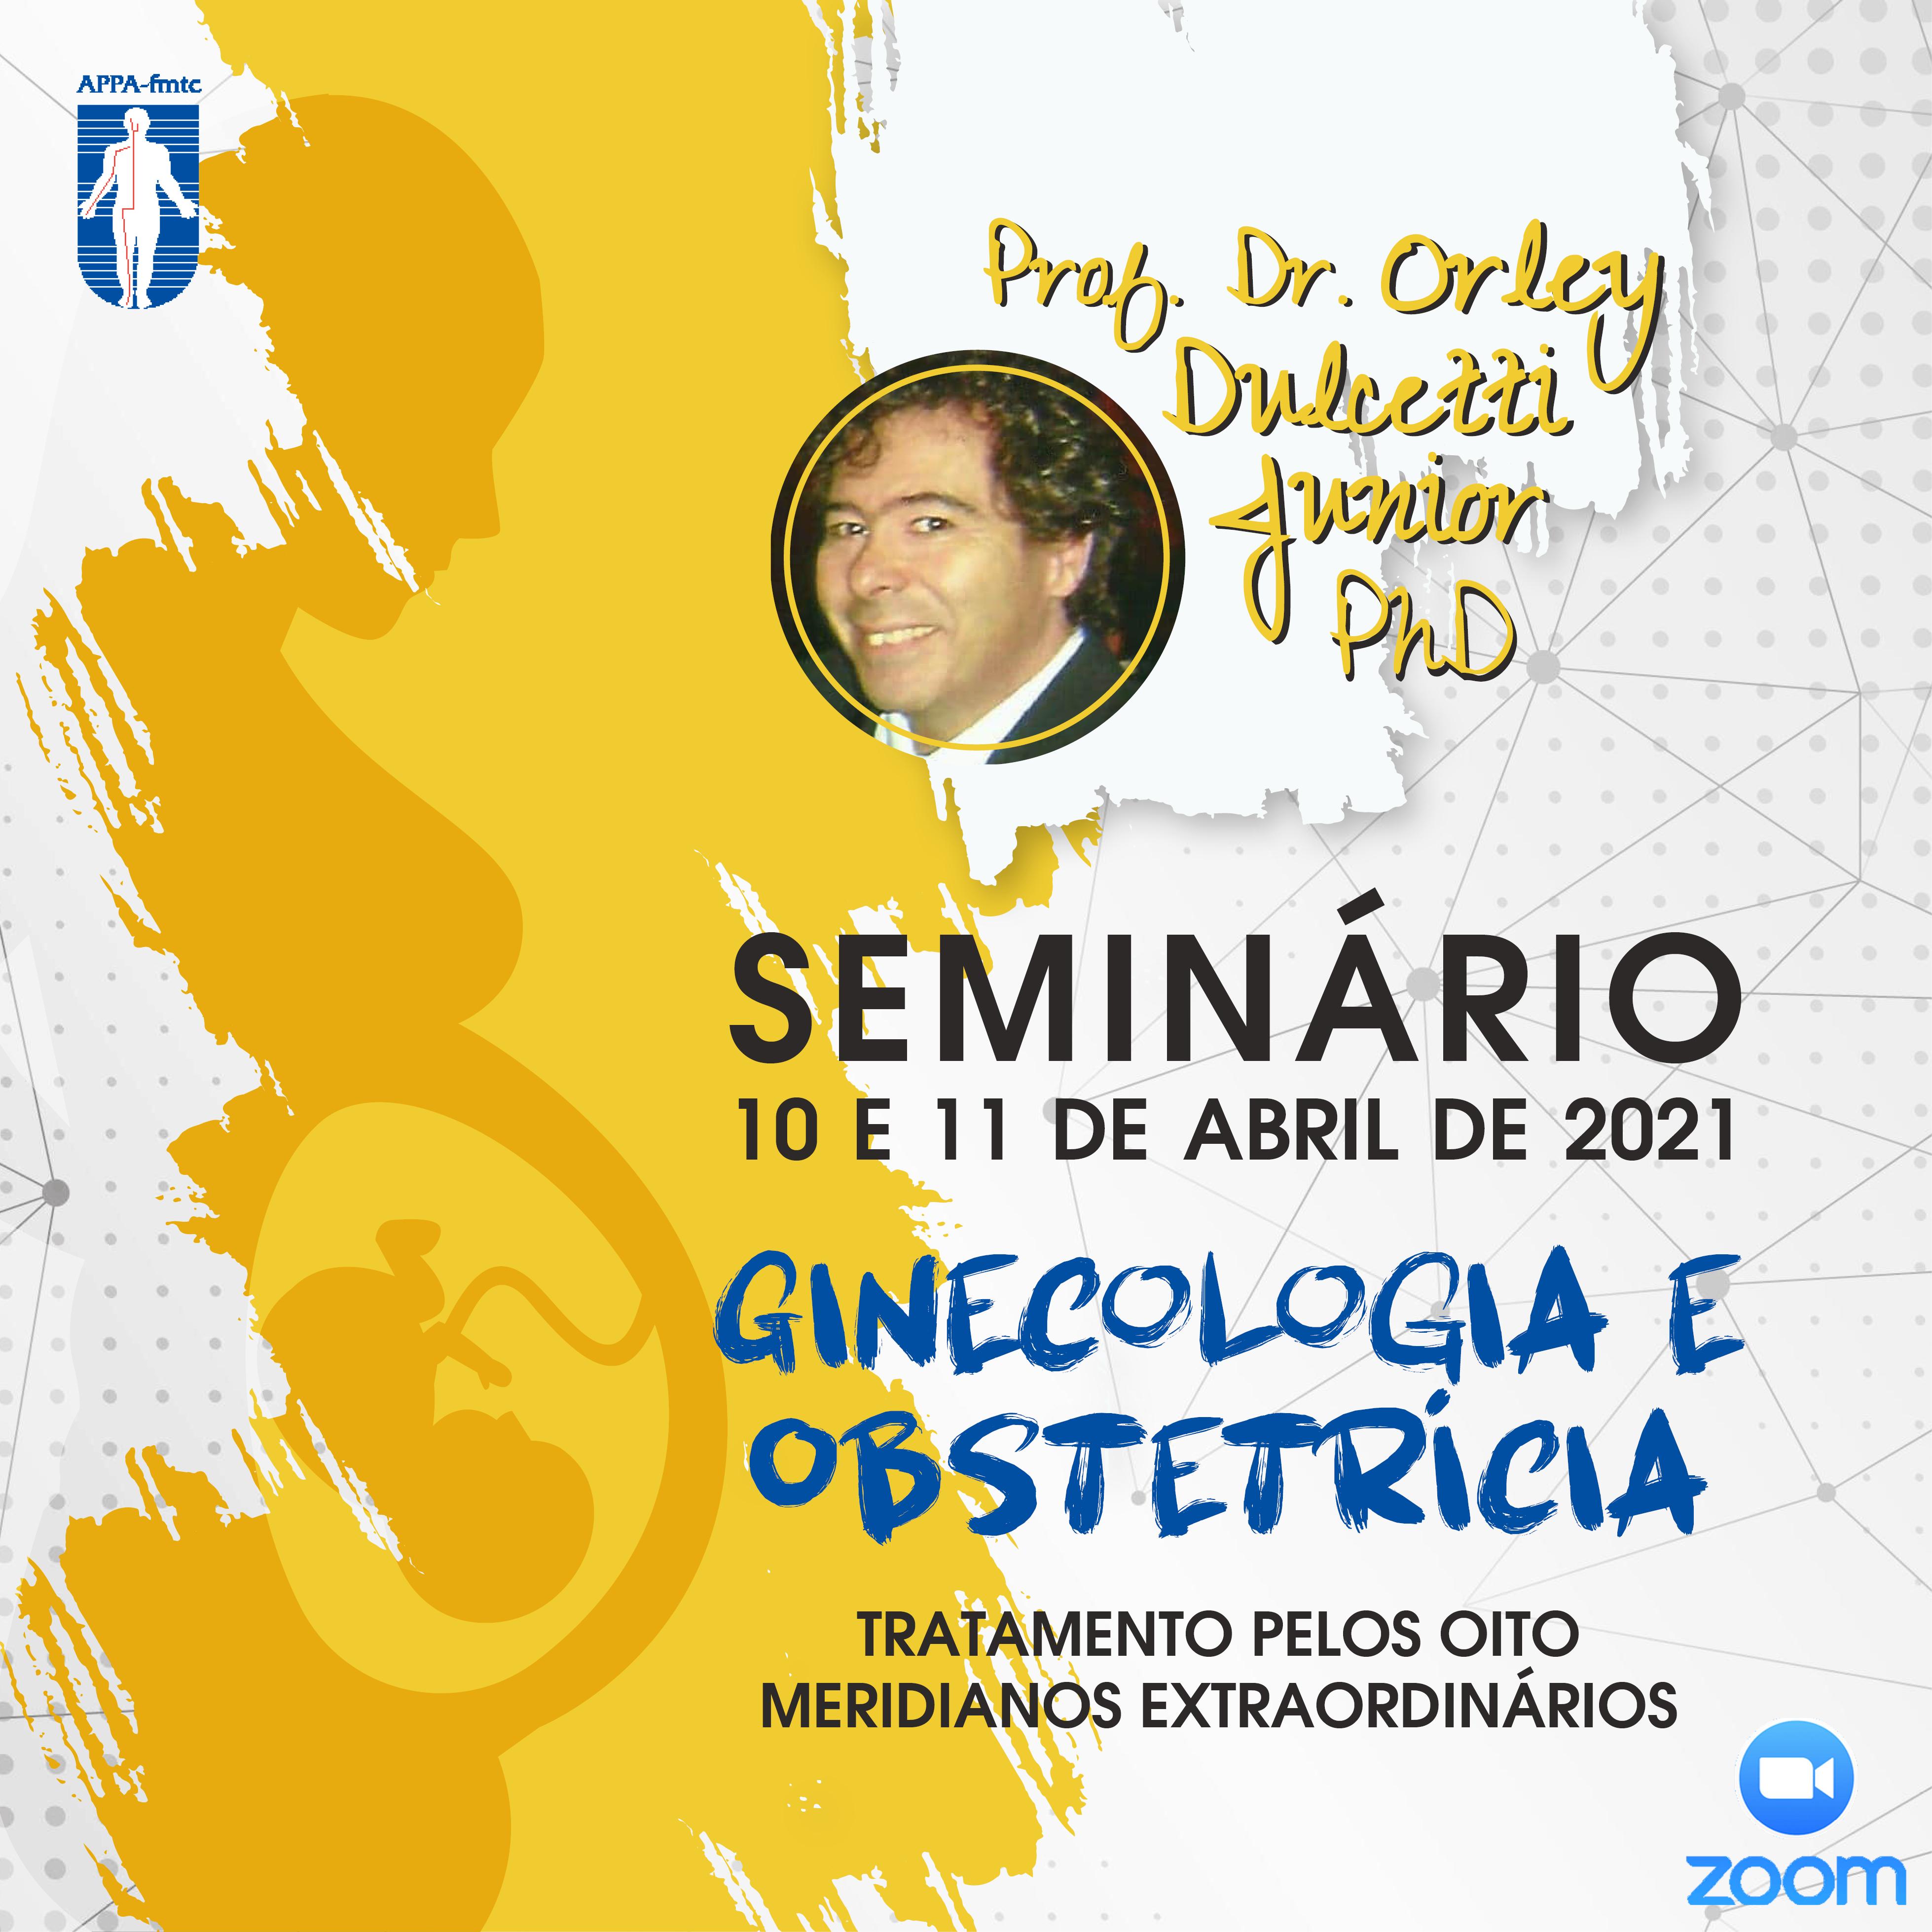 Post_Seminario_TratamentoOitoMeridianosExtra